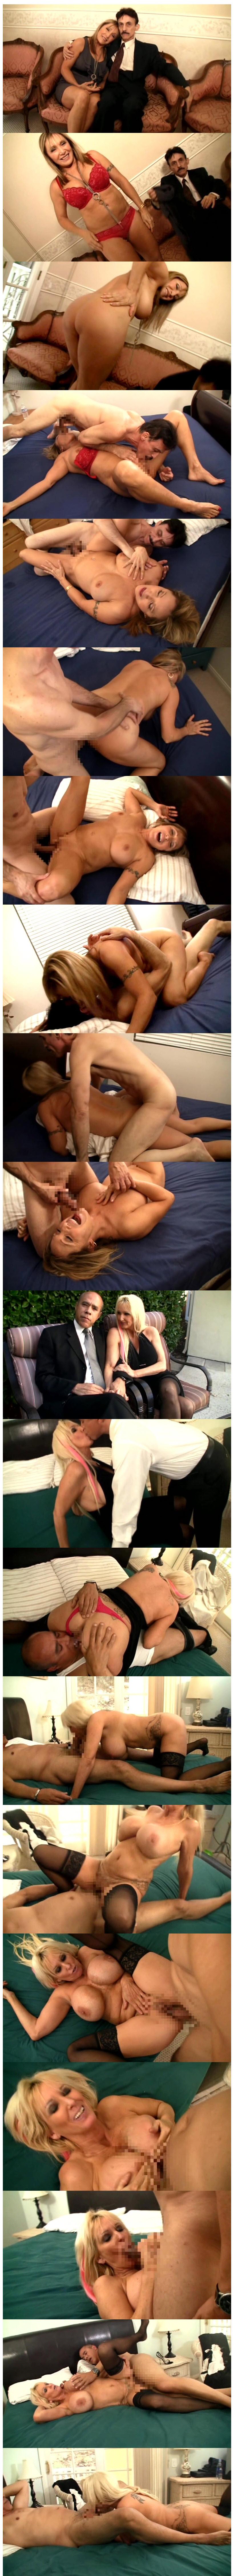 Akbs-001 Porn multiple-actress dvd update - august 16, 2013